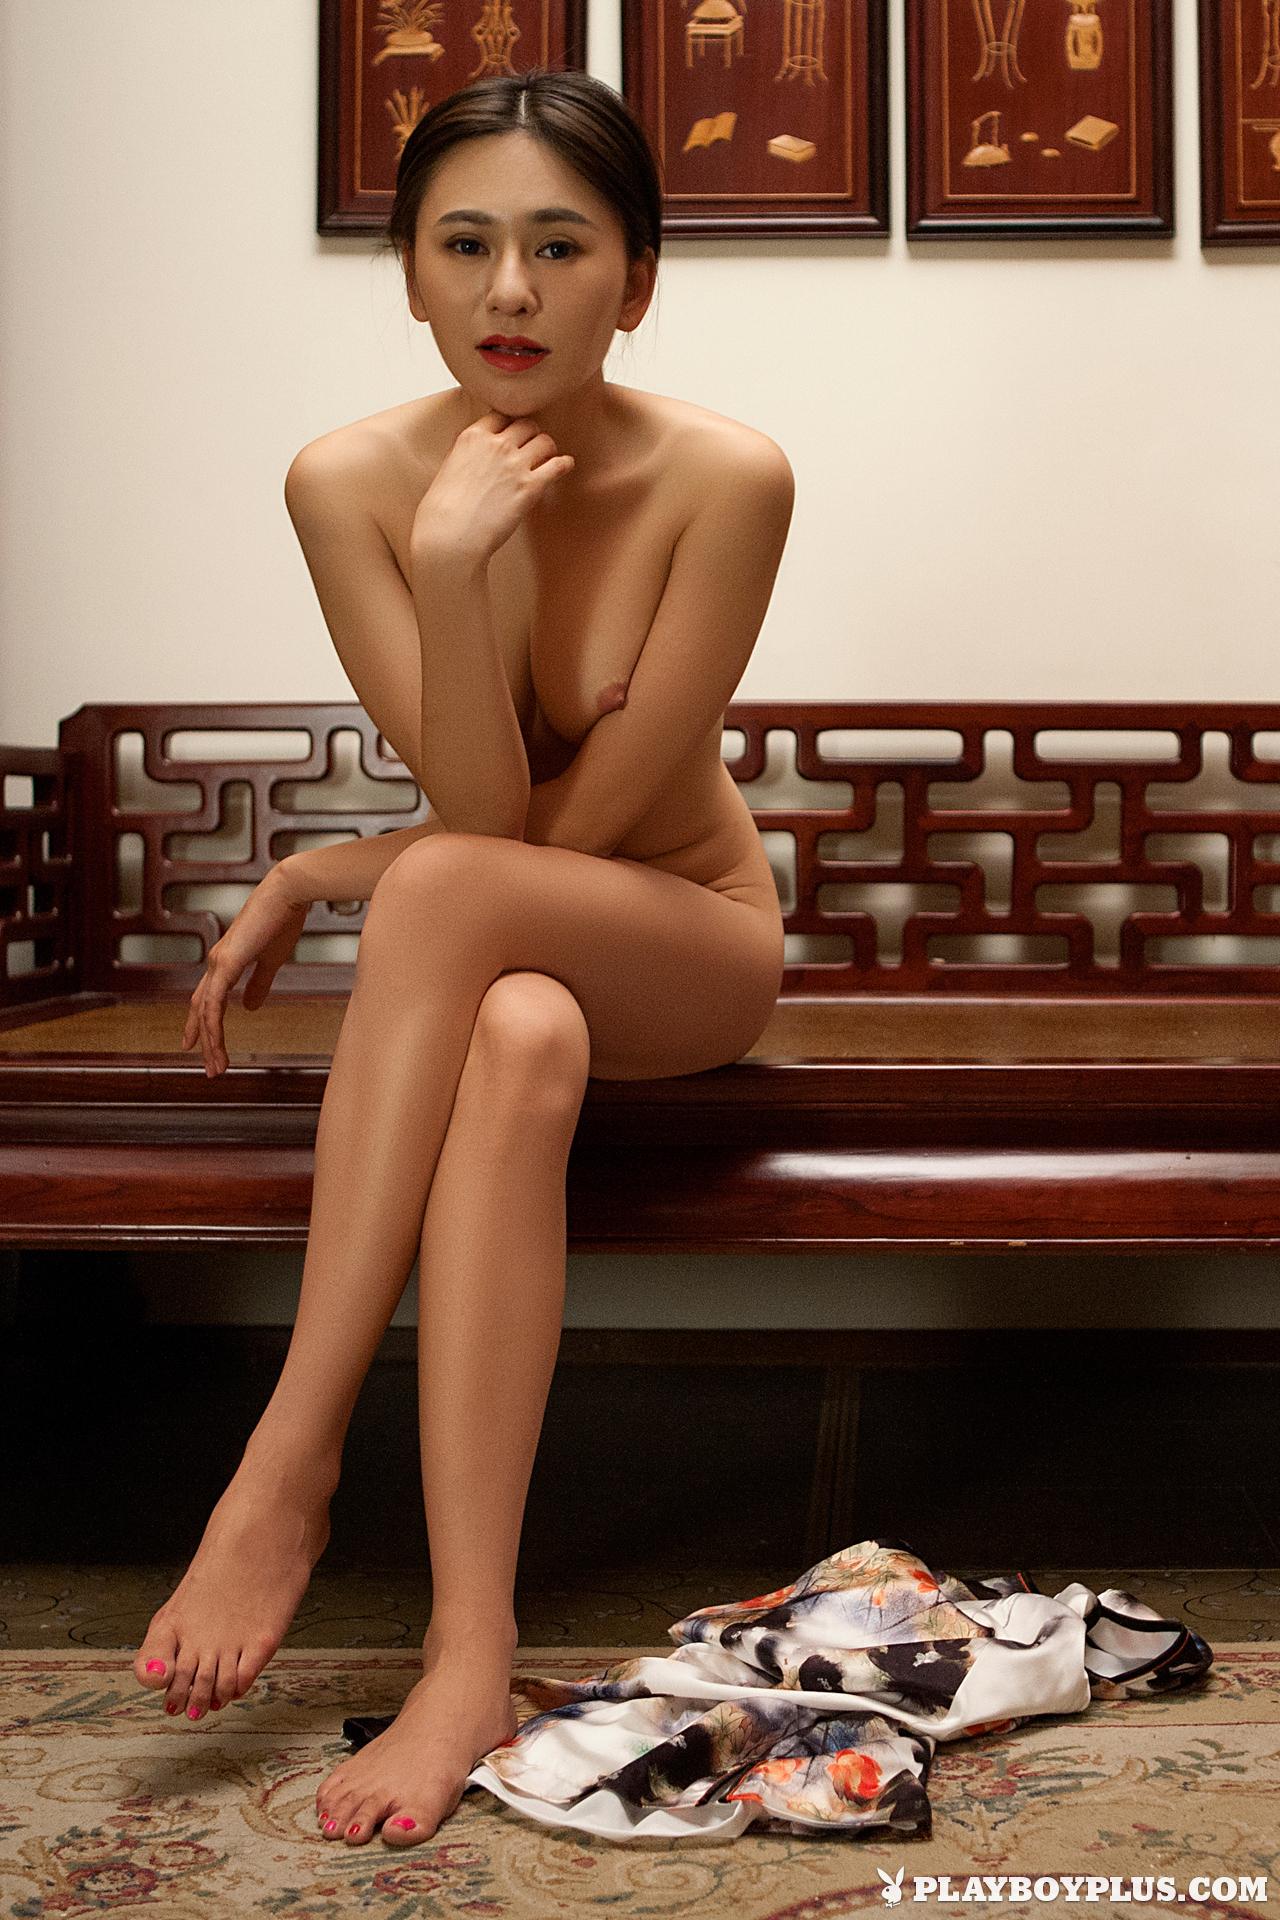 wu-muxi-nude-chinese-girl-short-dress-playboy-13